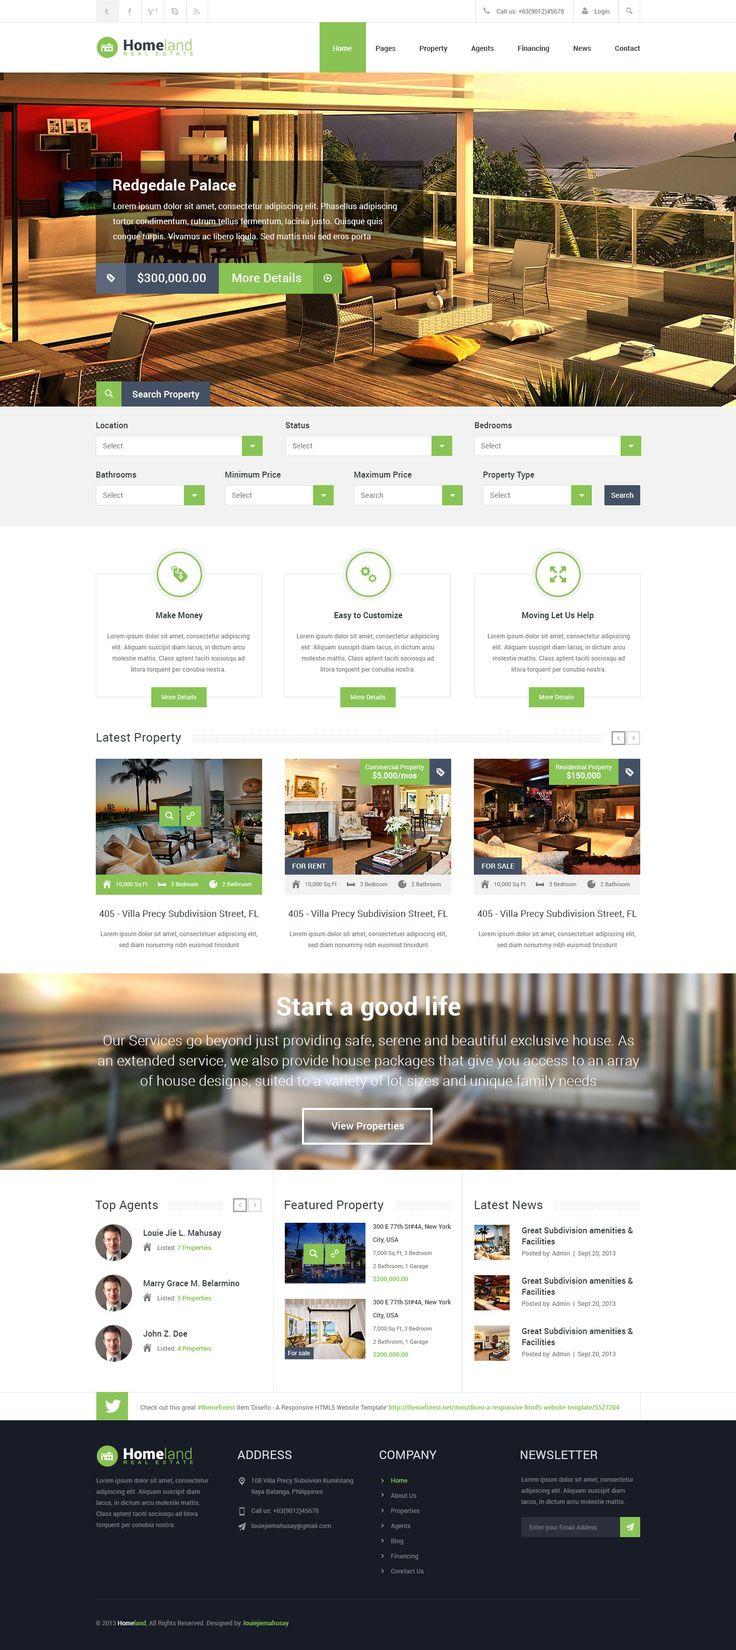 Very nice real estate web design.